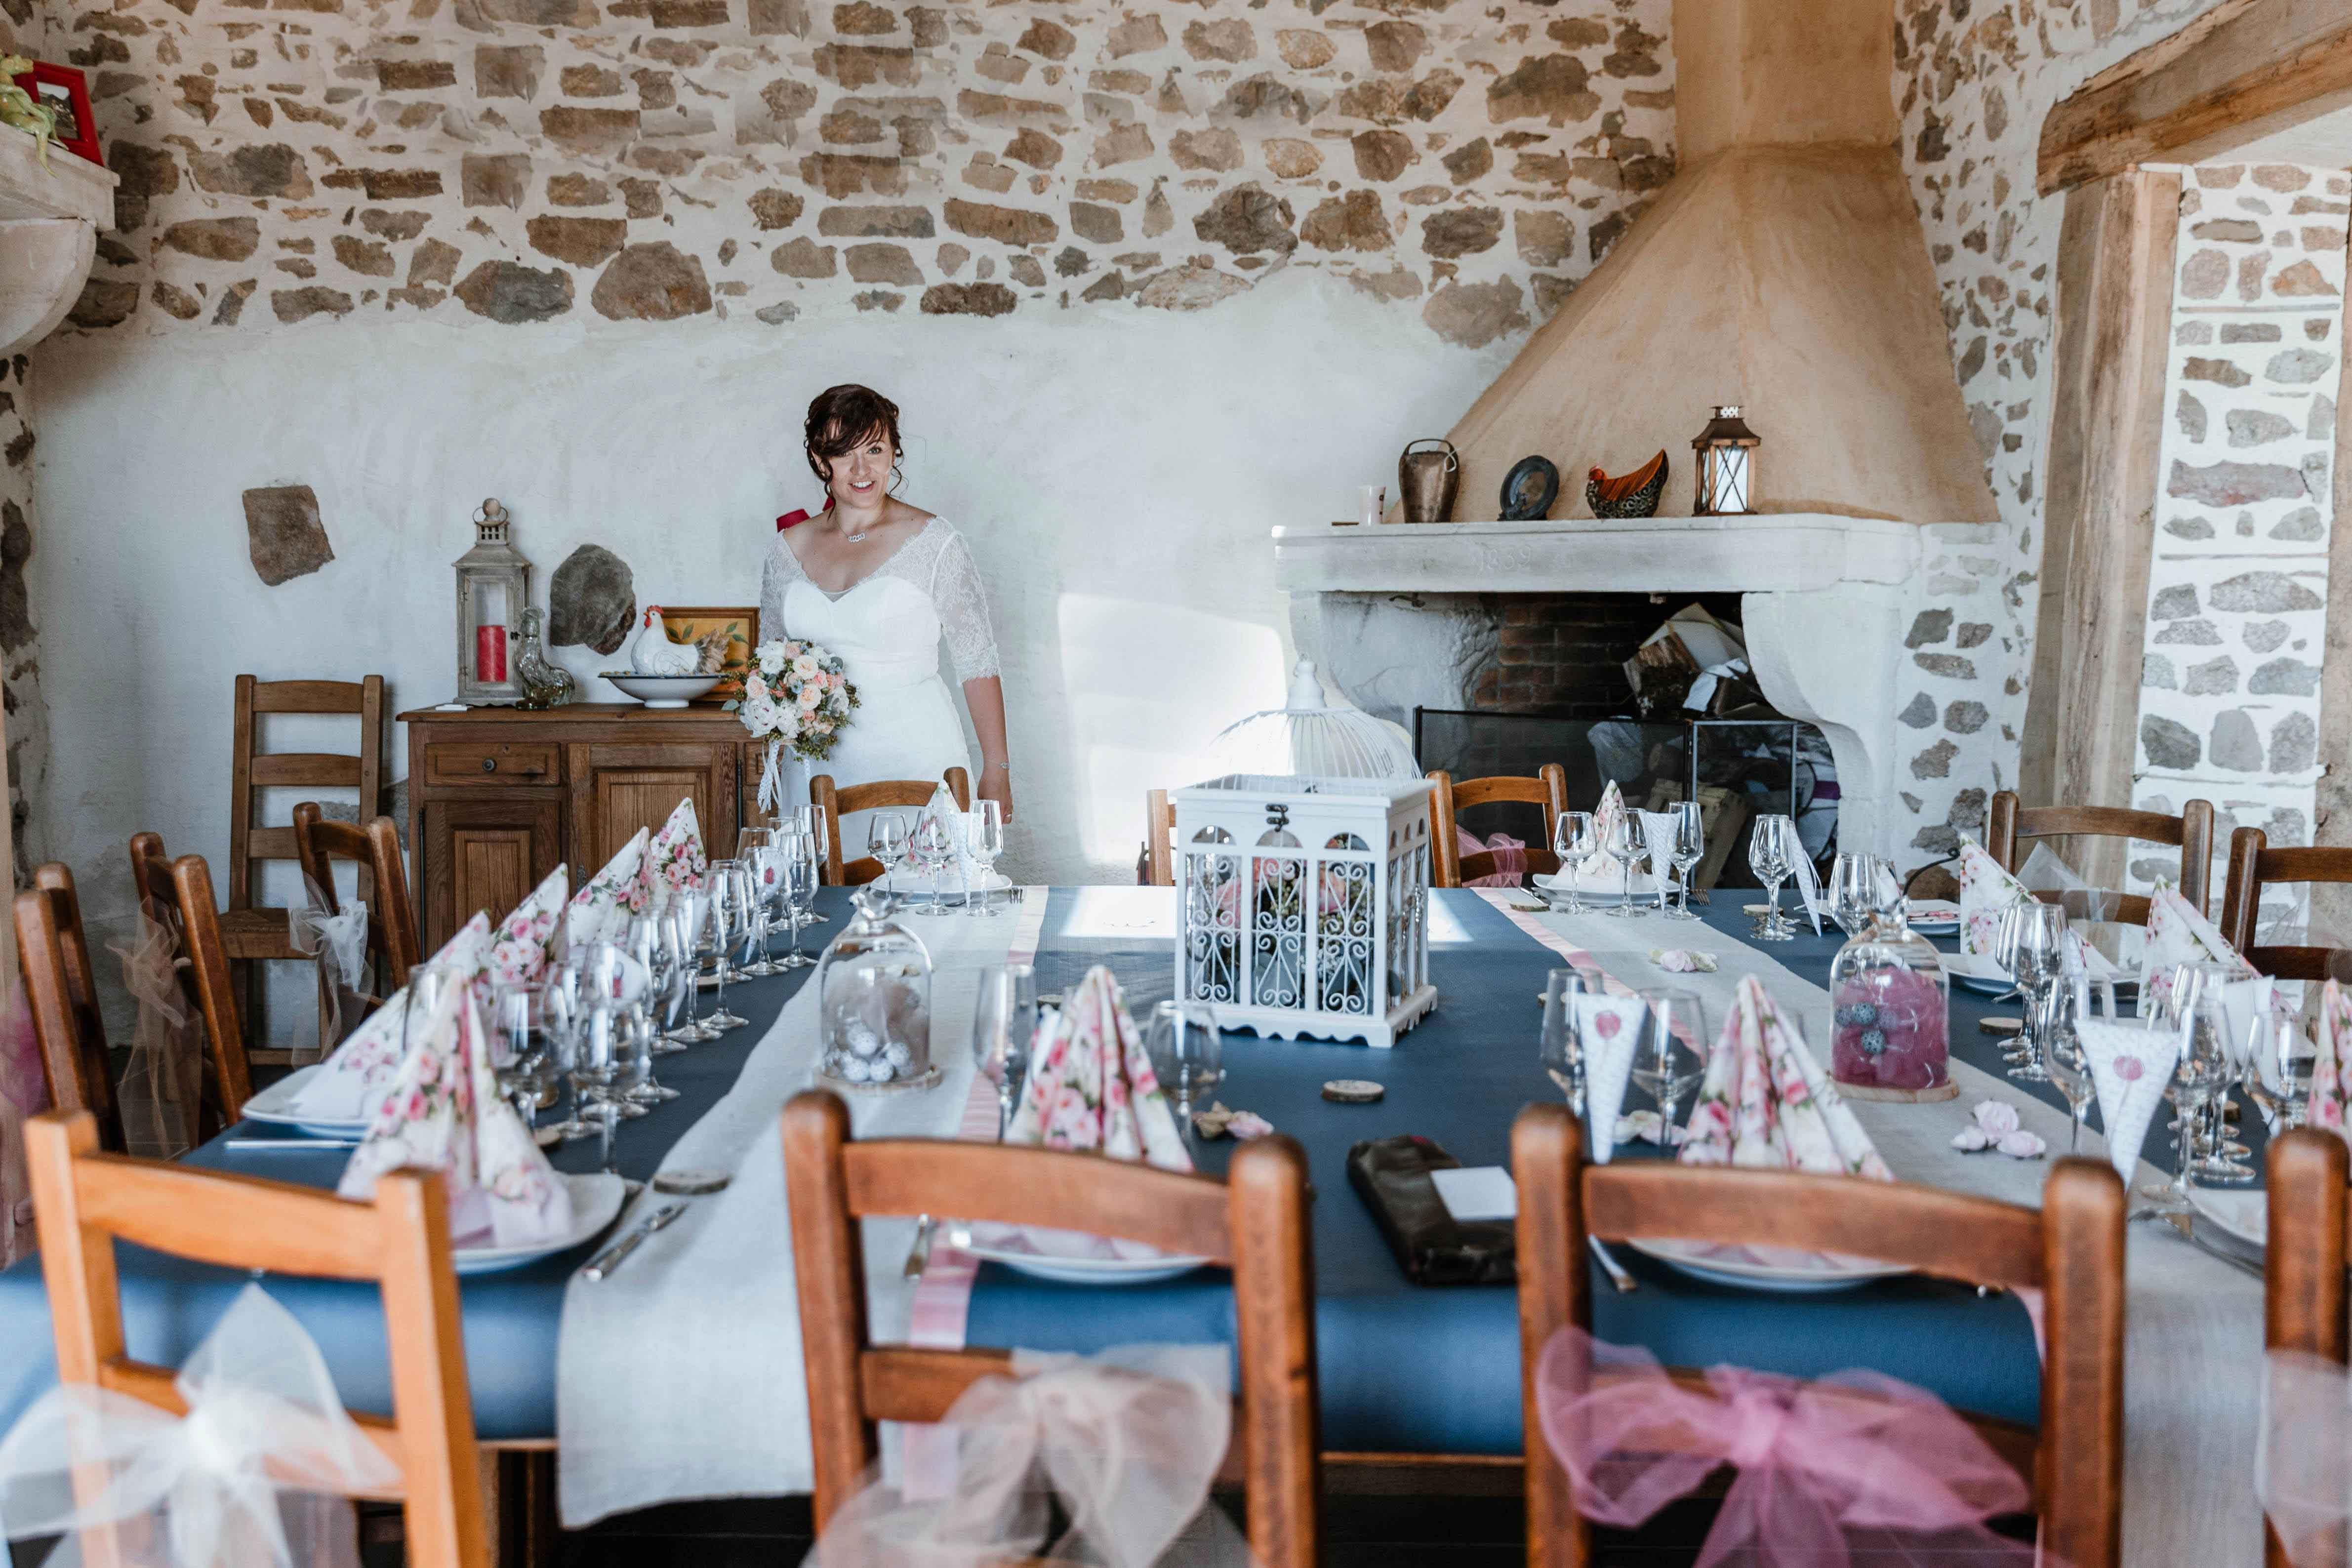 photographe beaujolais lyon avenas décoration